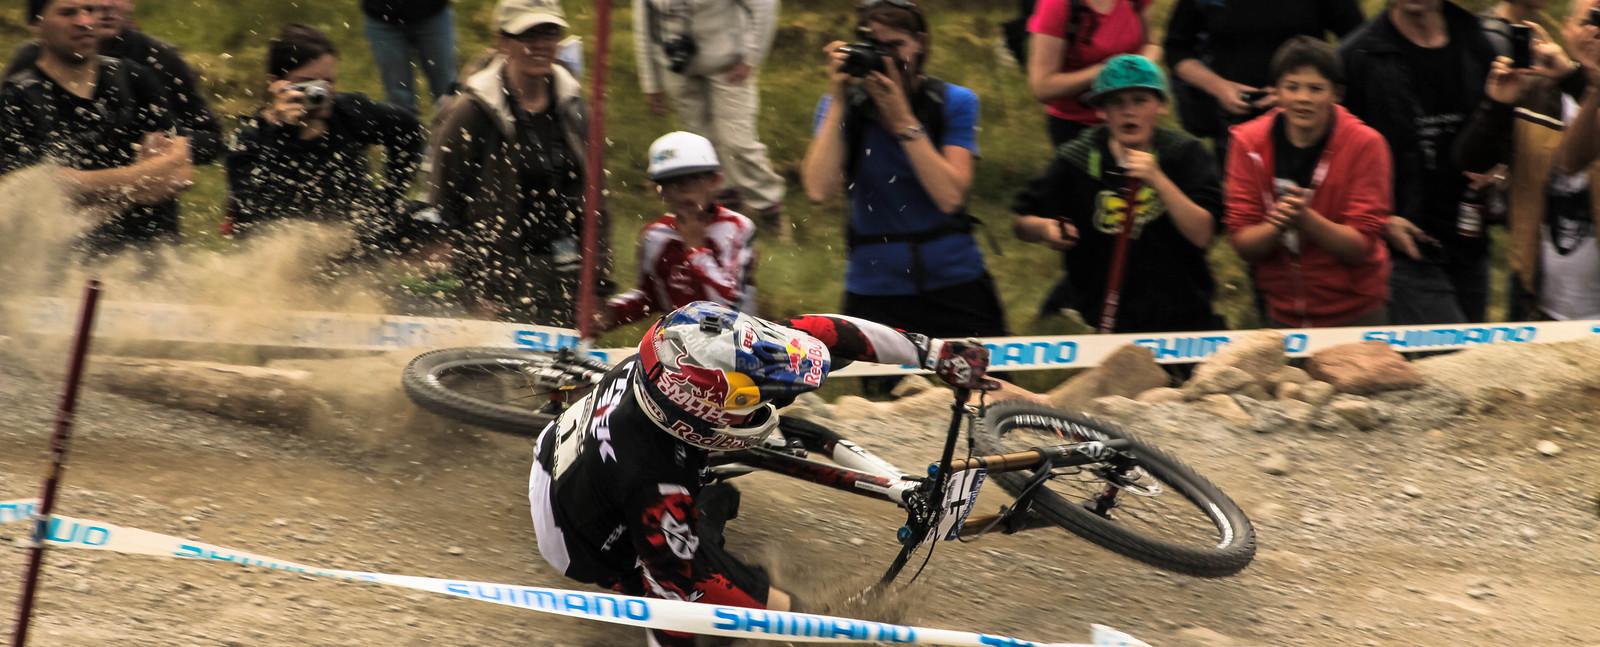 Aaron Gwin Fort William 2012  - CMarshall - Mountain Biking Pictures - Vital MTB